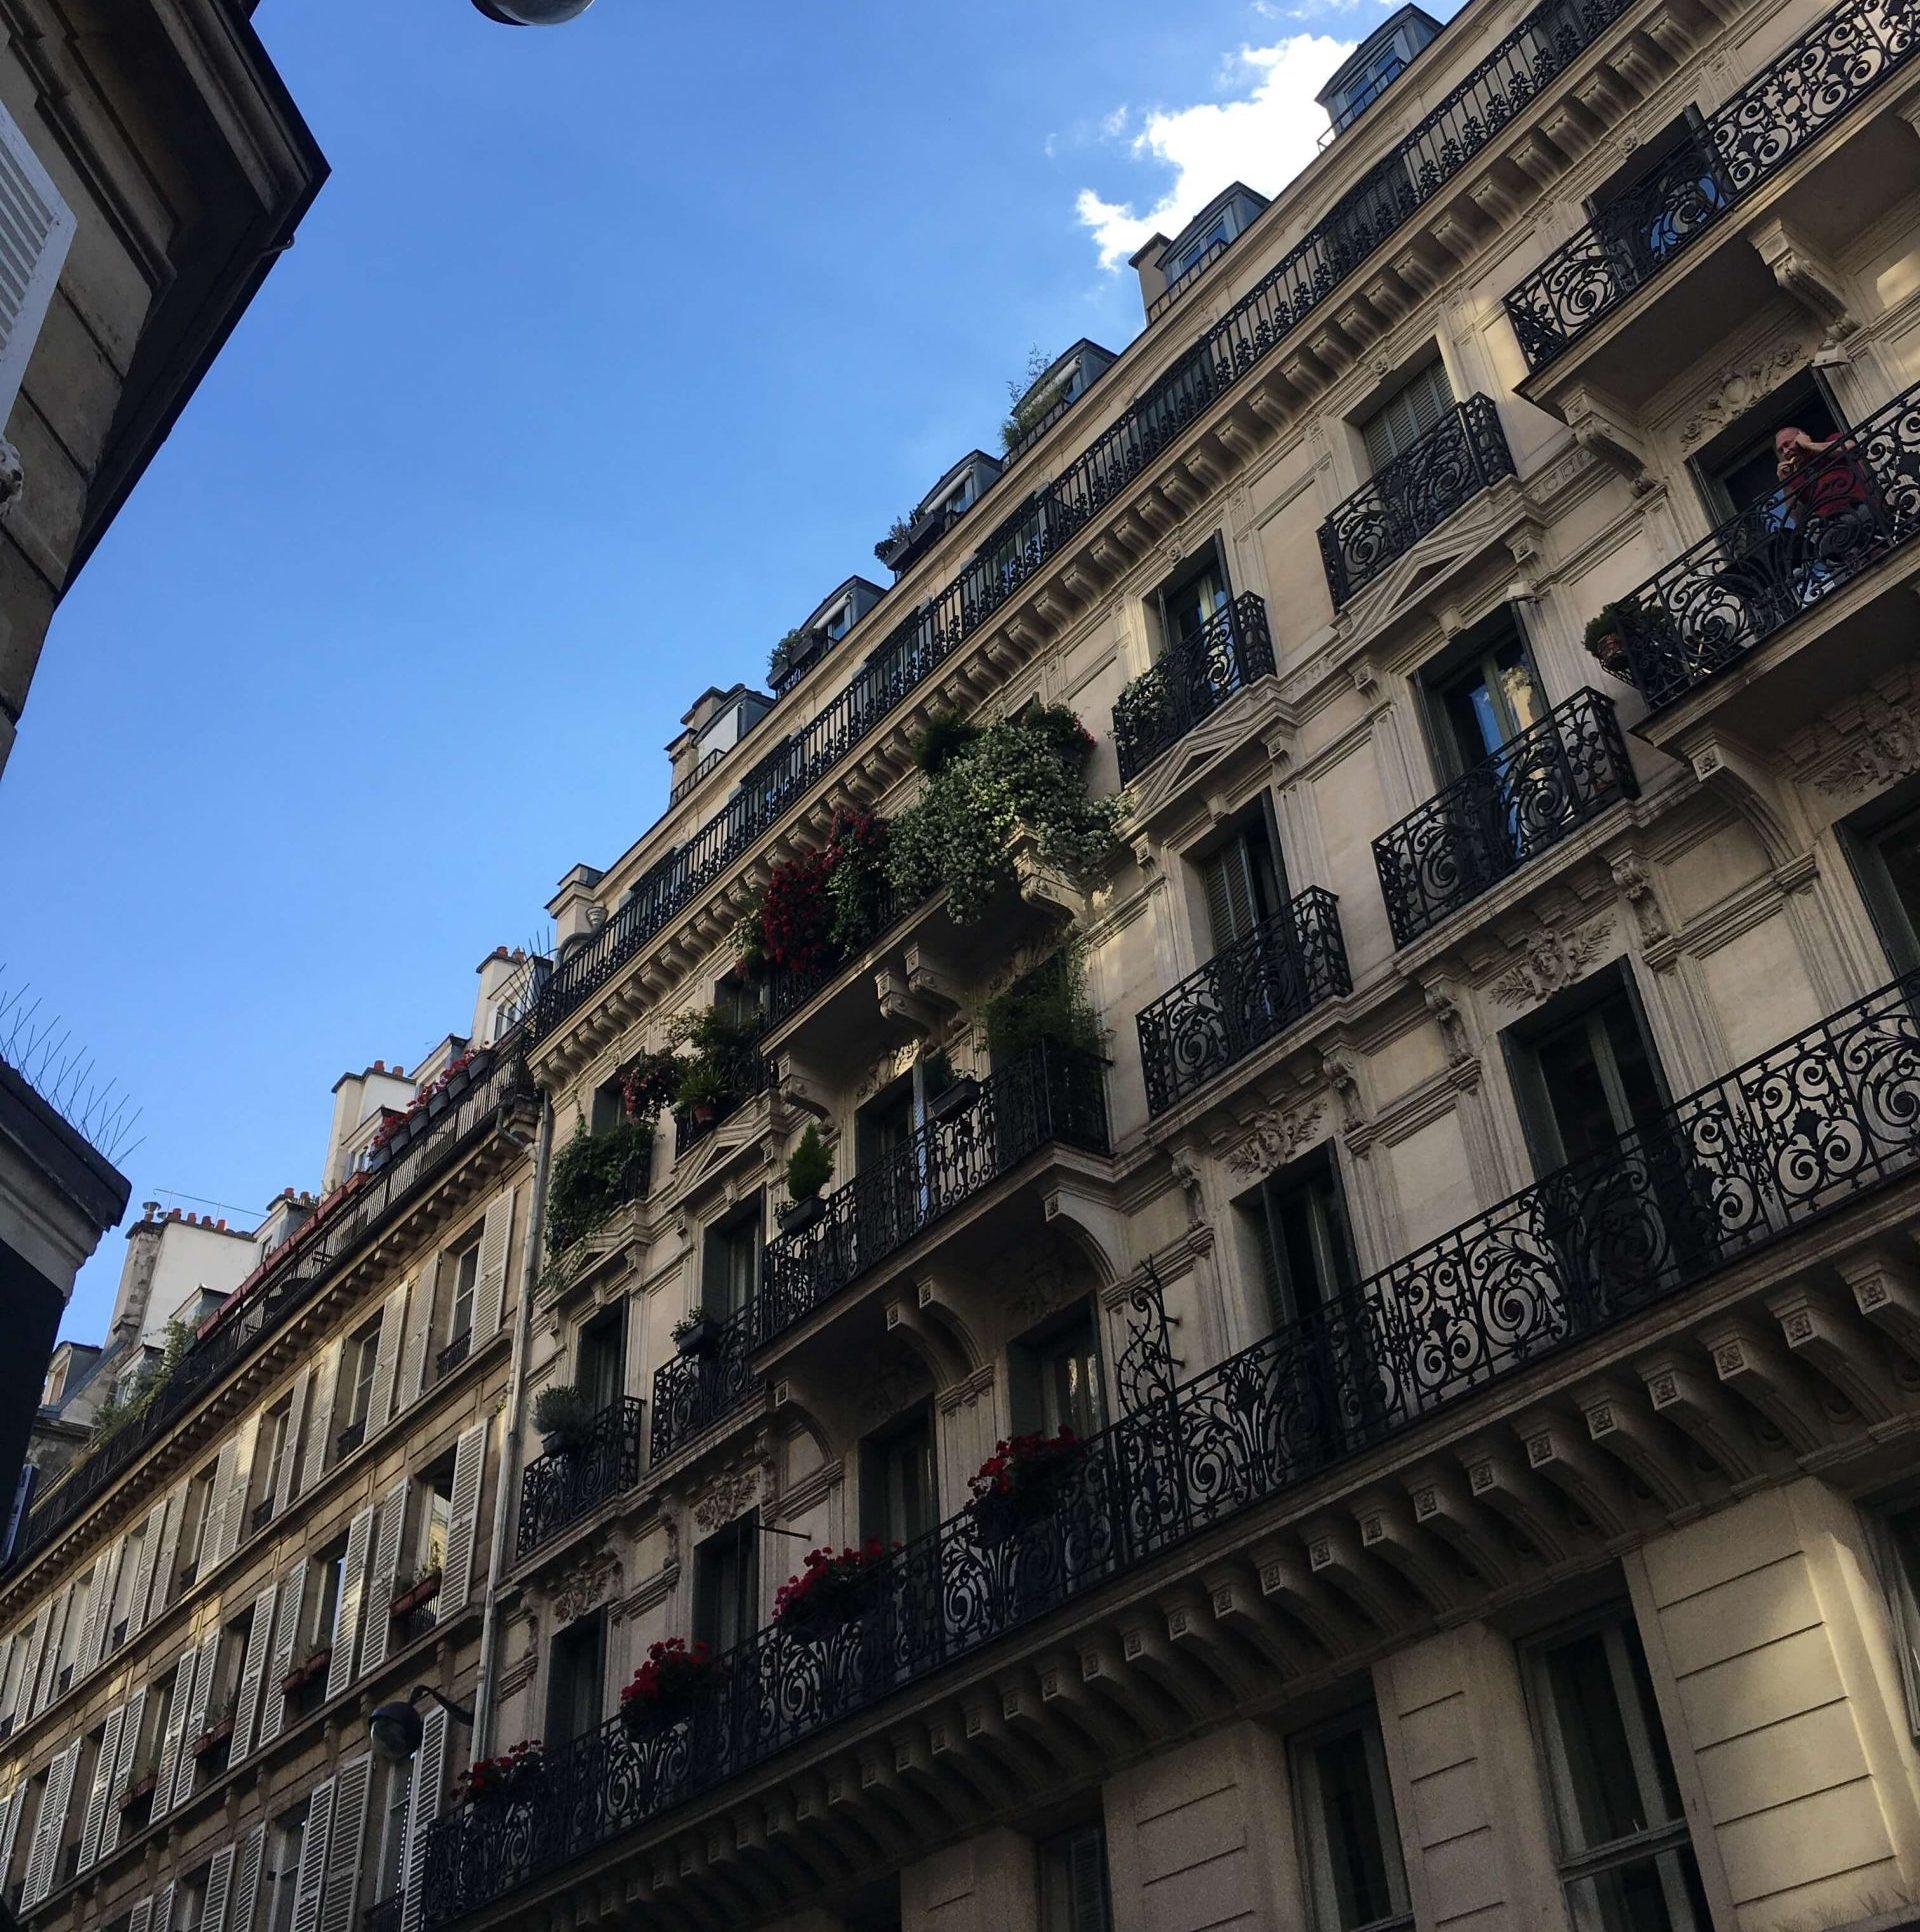 Balconies in Châtelet